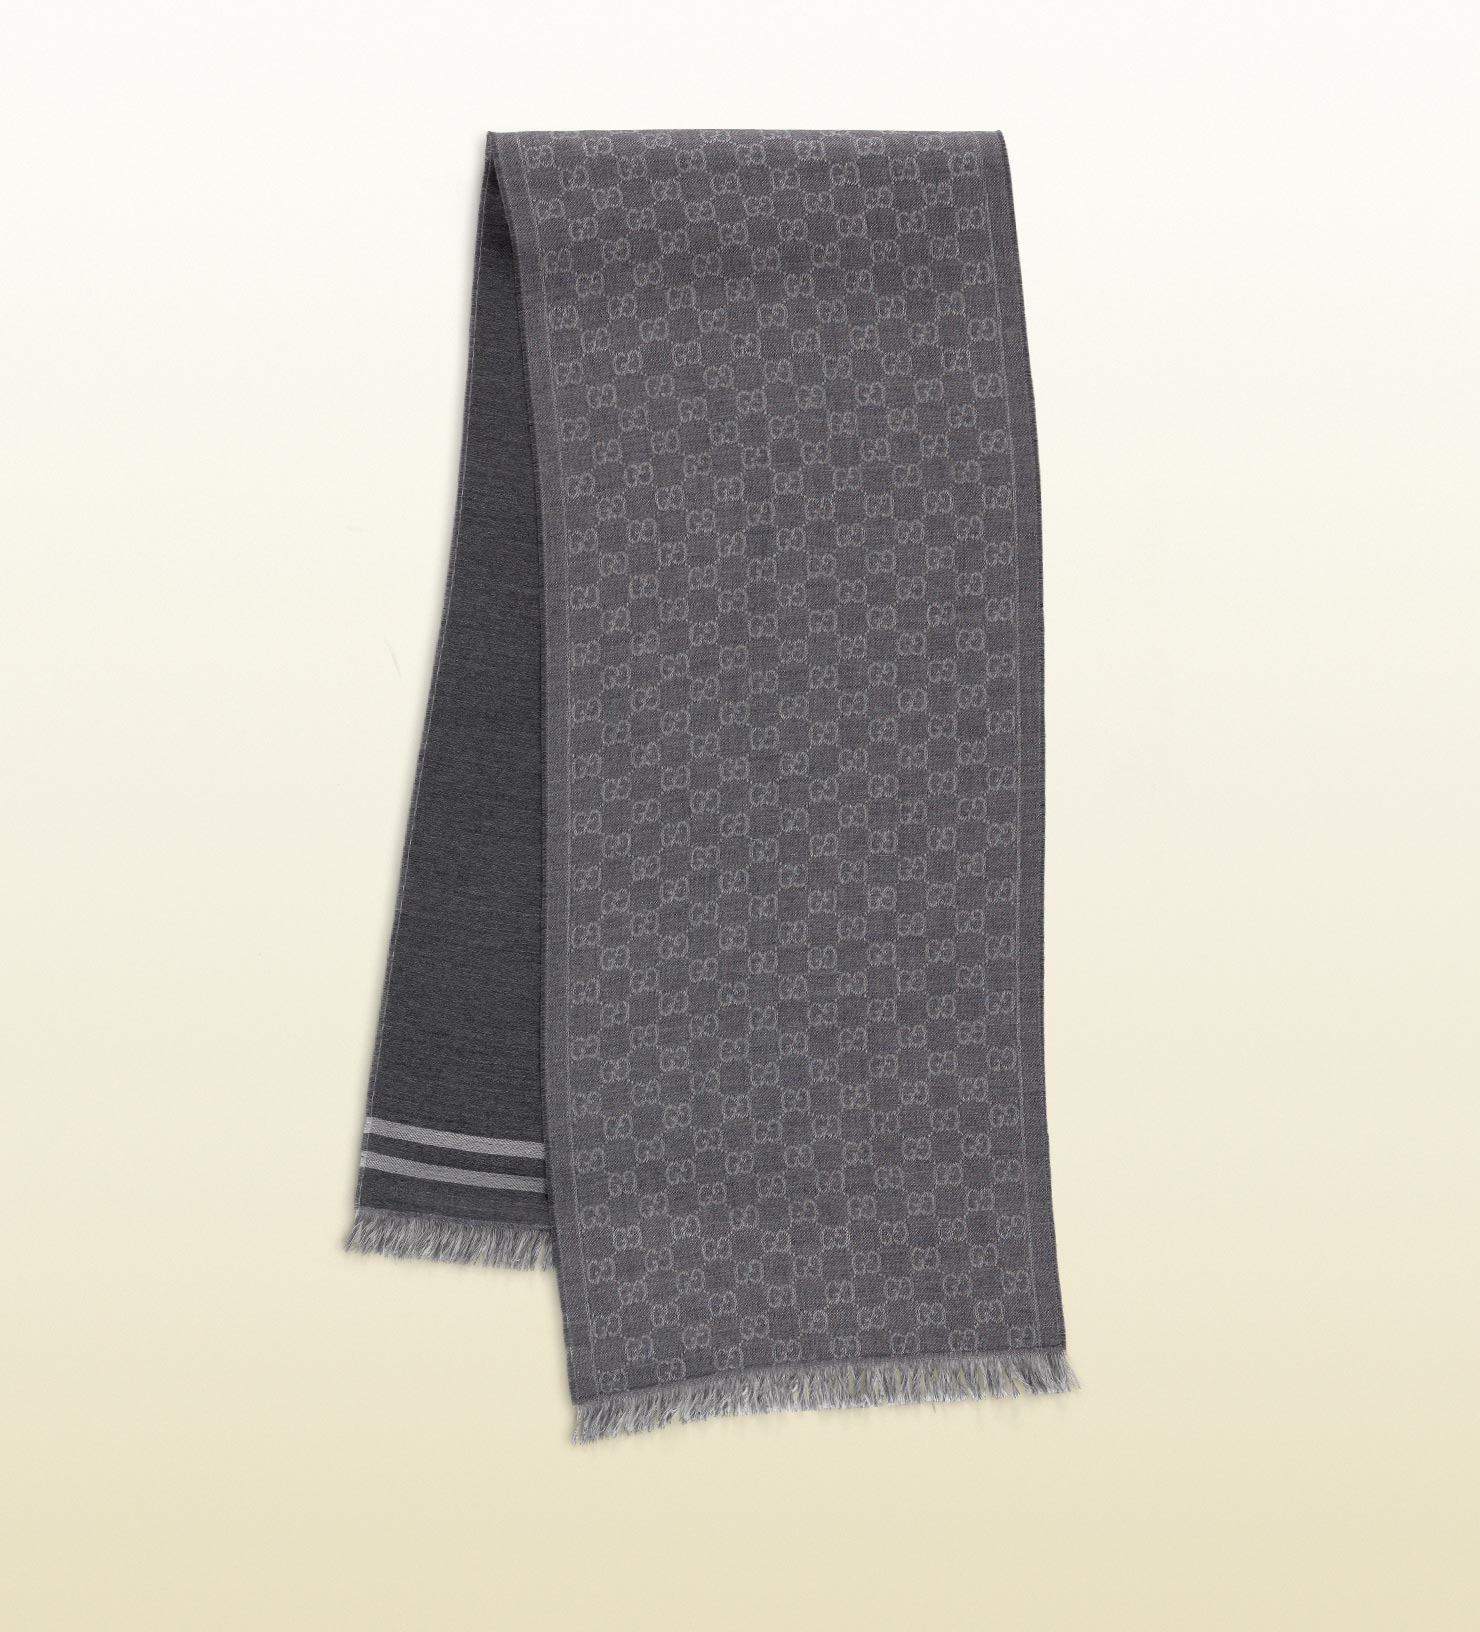 GG jacquard pattern knitted scarf - Black Gucci 5qkBl